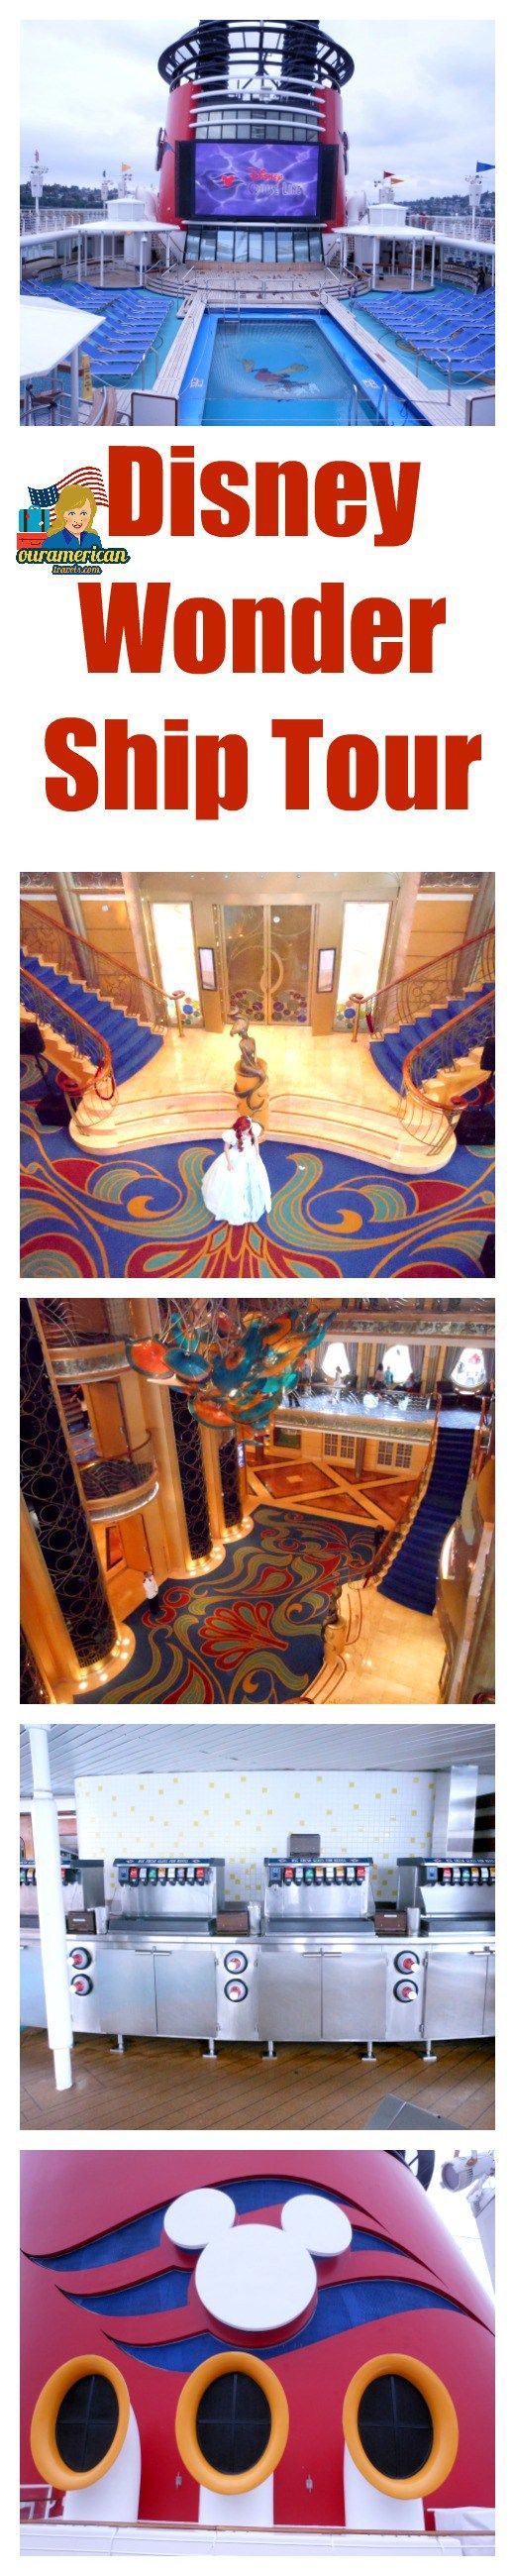 Disney Wonder Ship Tour